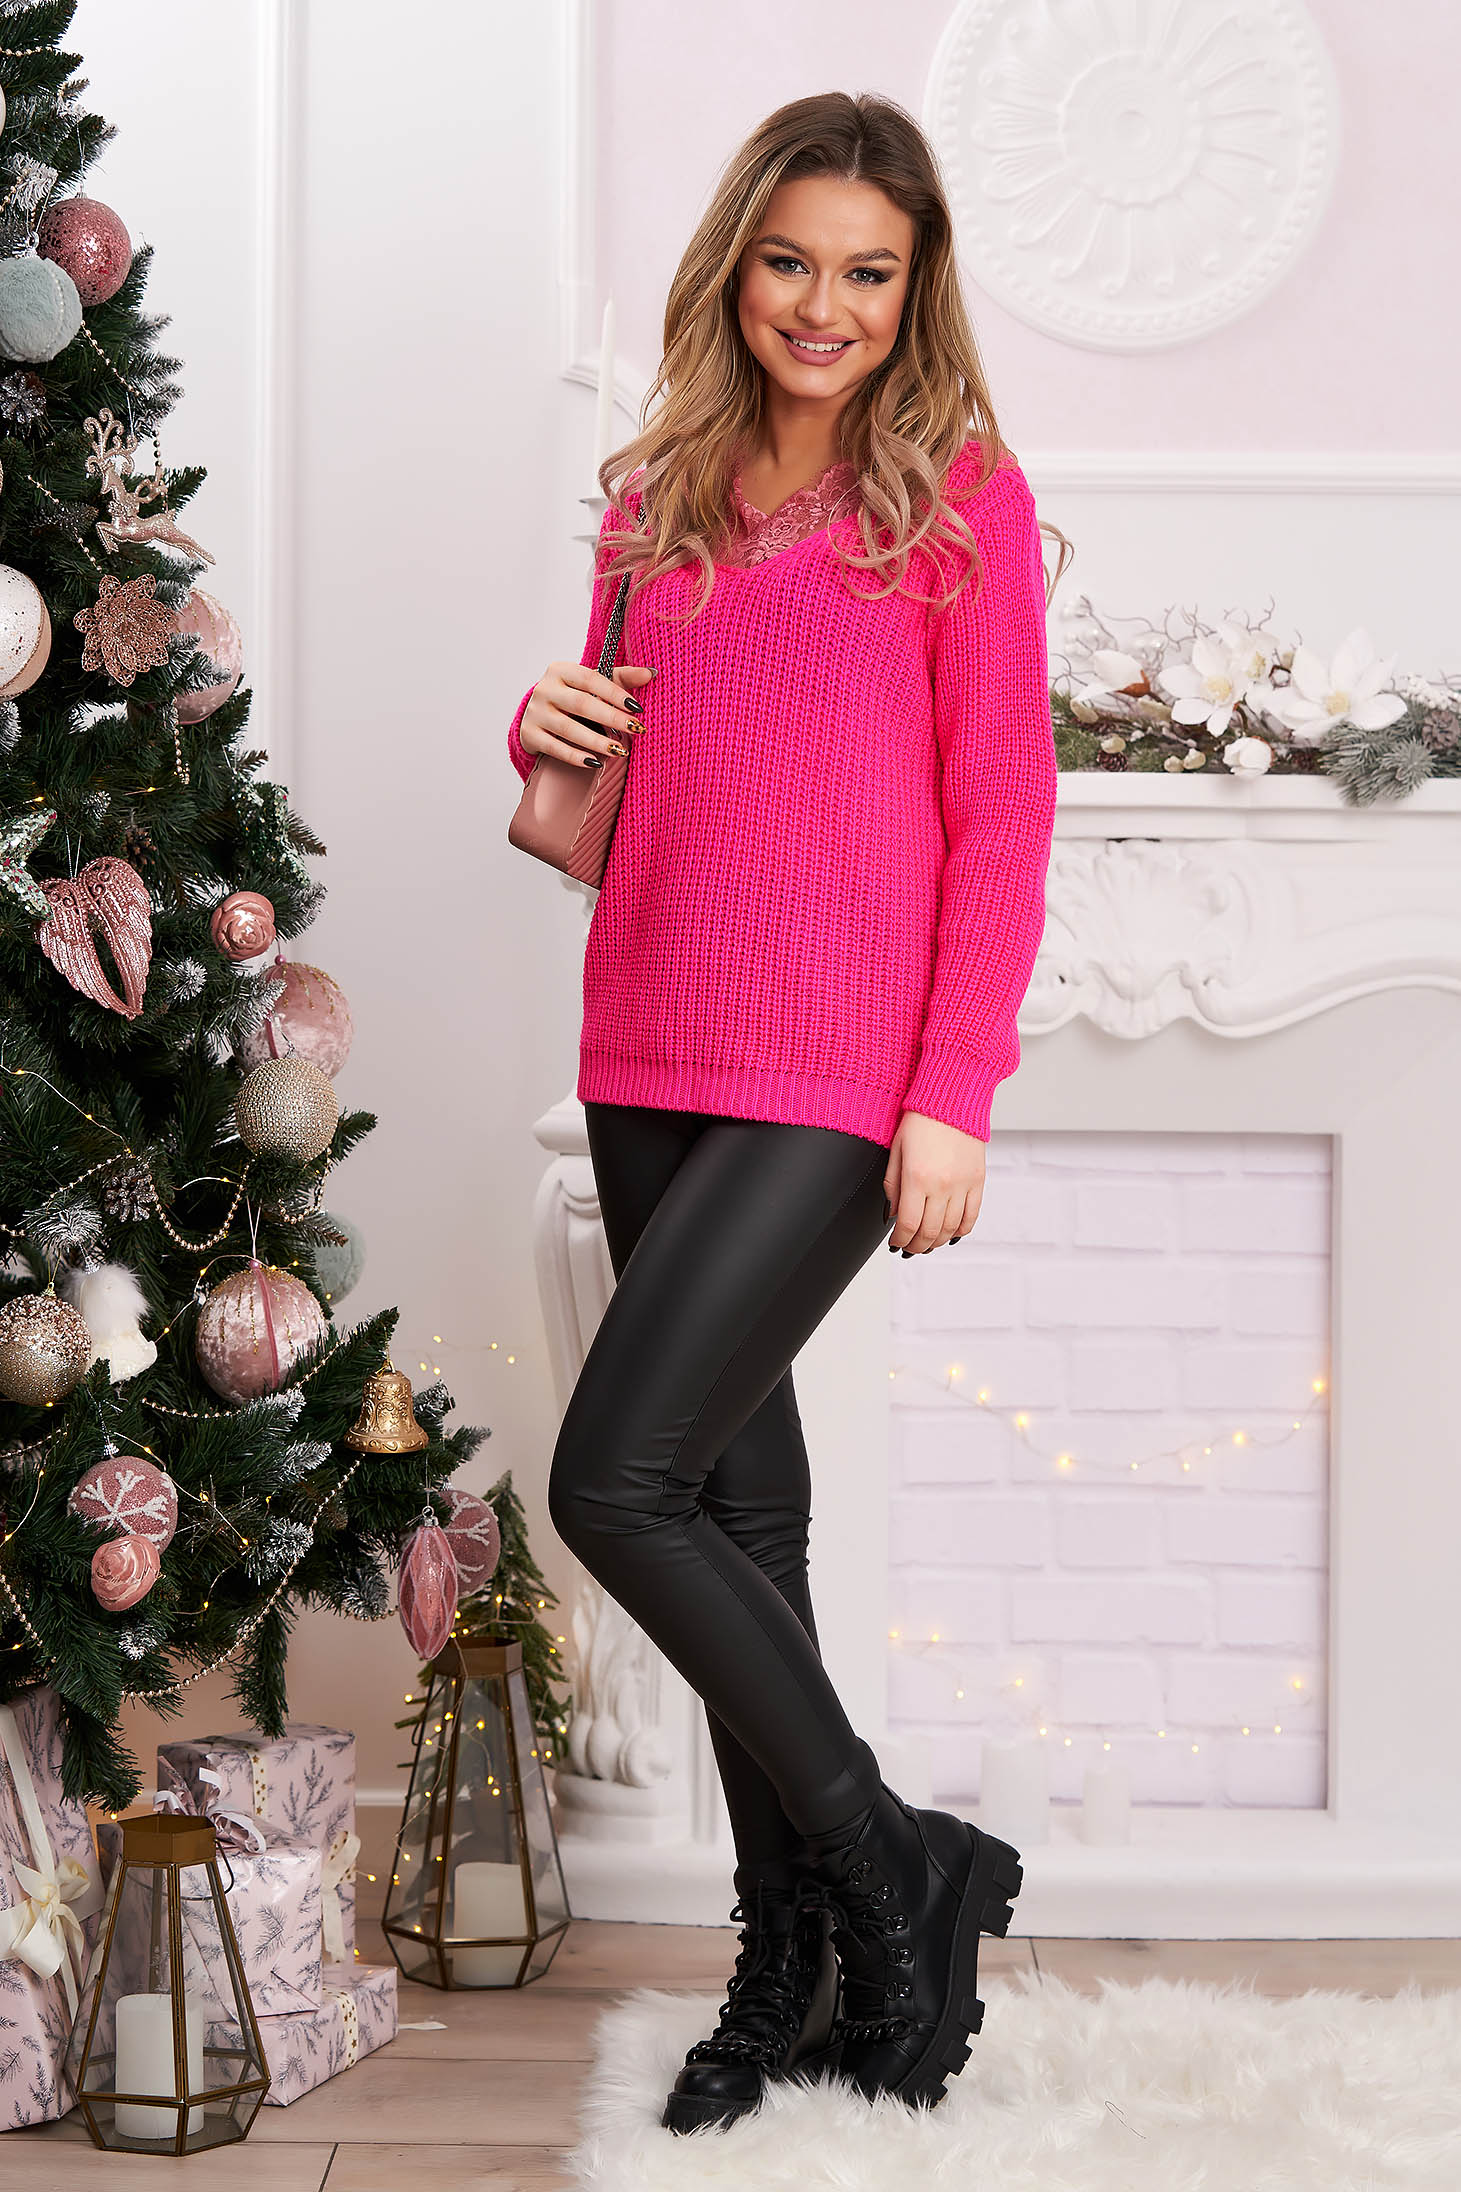 Pulover roz tricotat cu croi larg si aplicatii de dantela